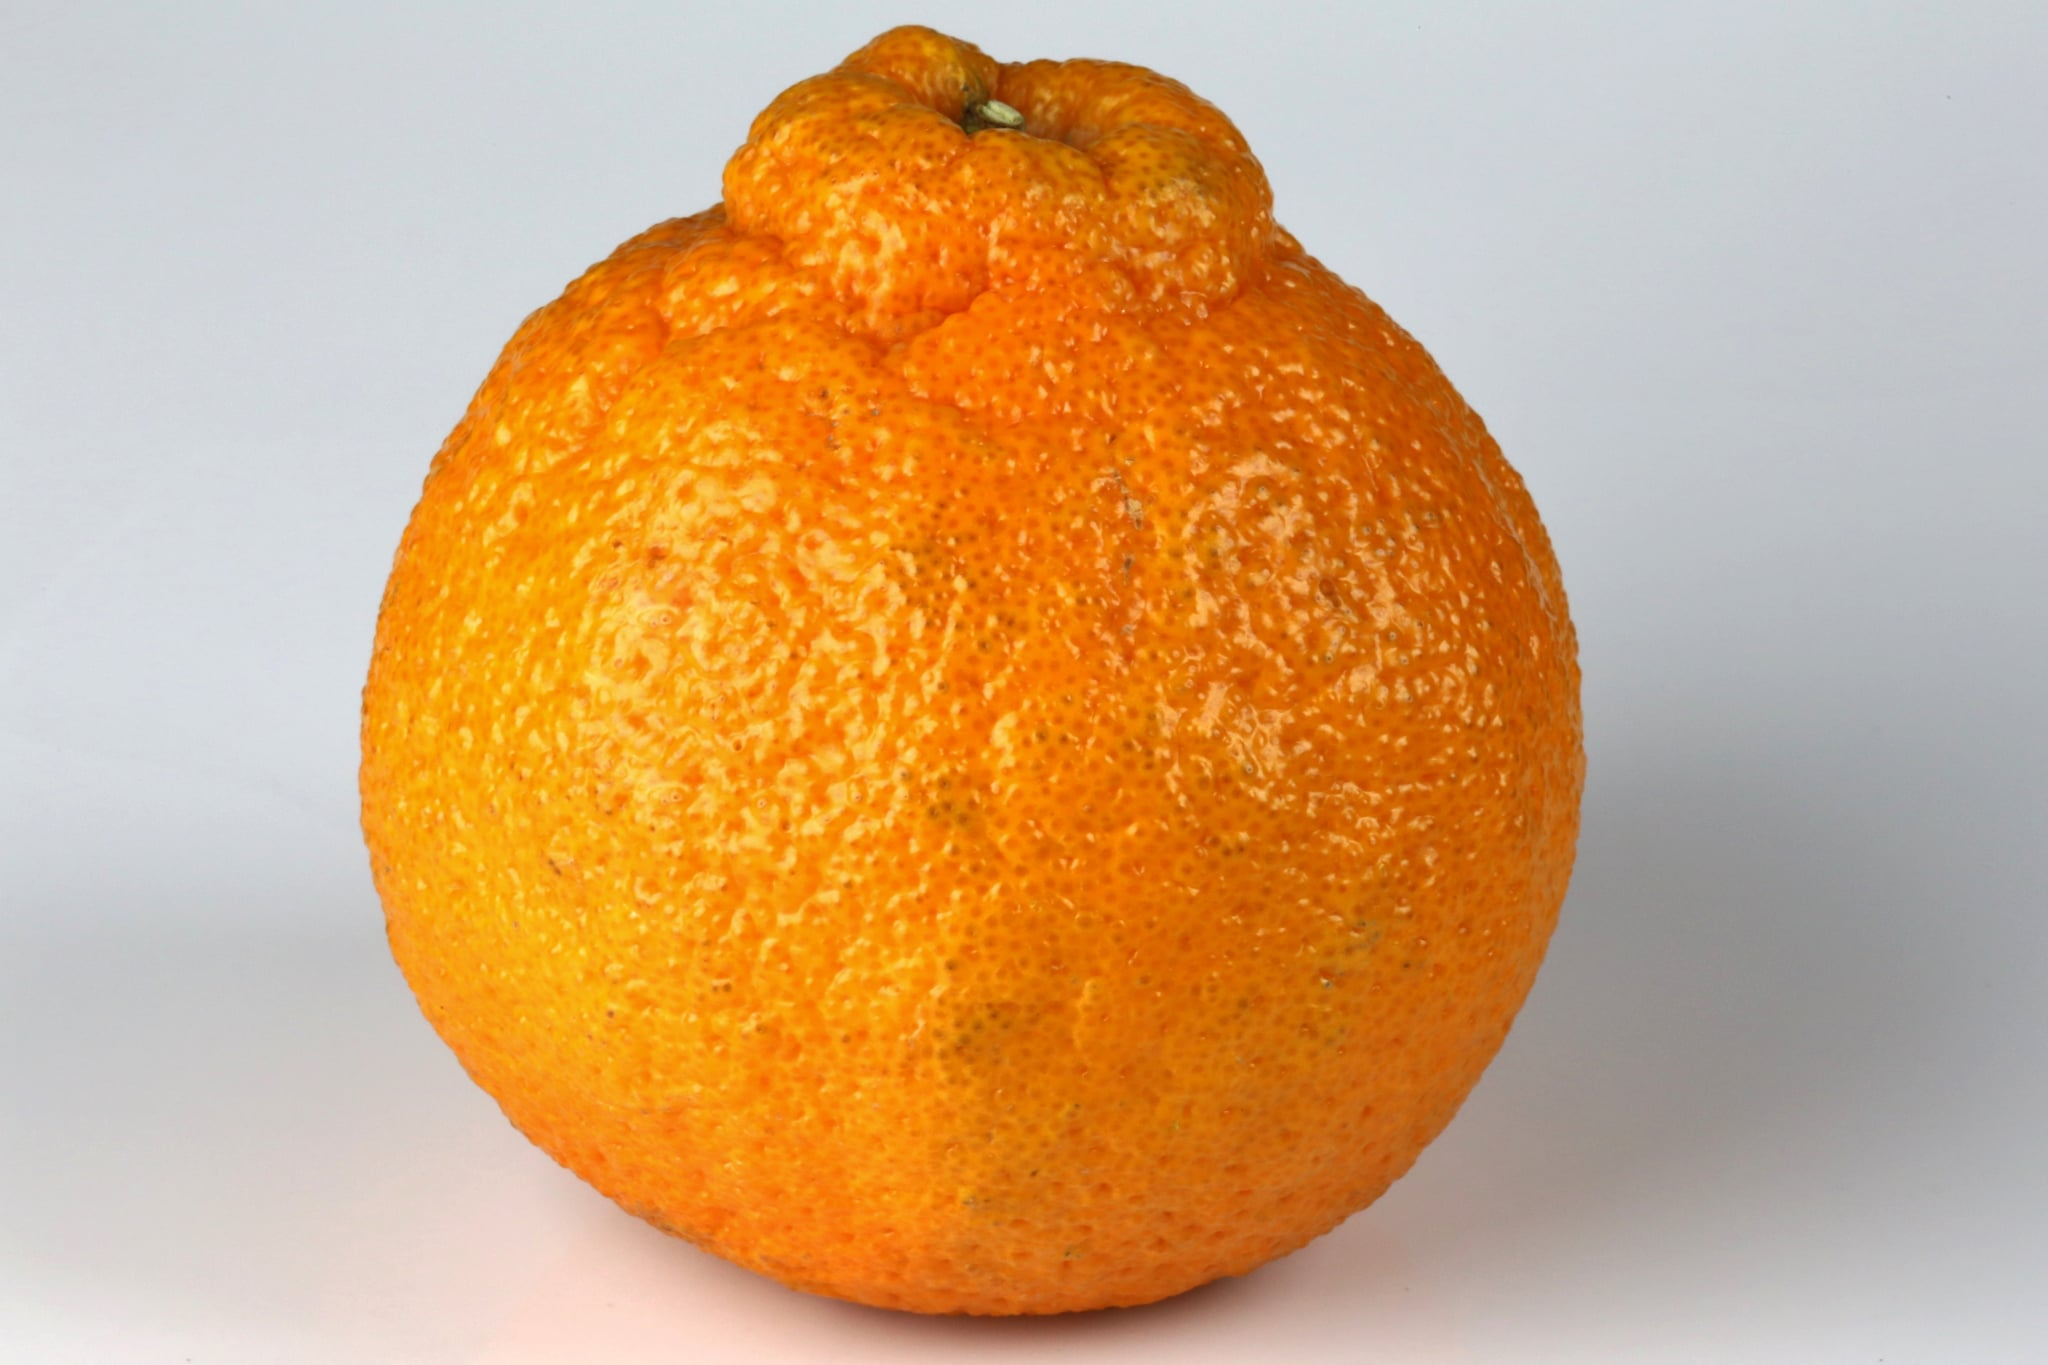 Or sometimes known as a Sumo Mandarin Orange